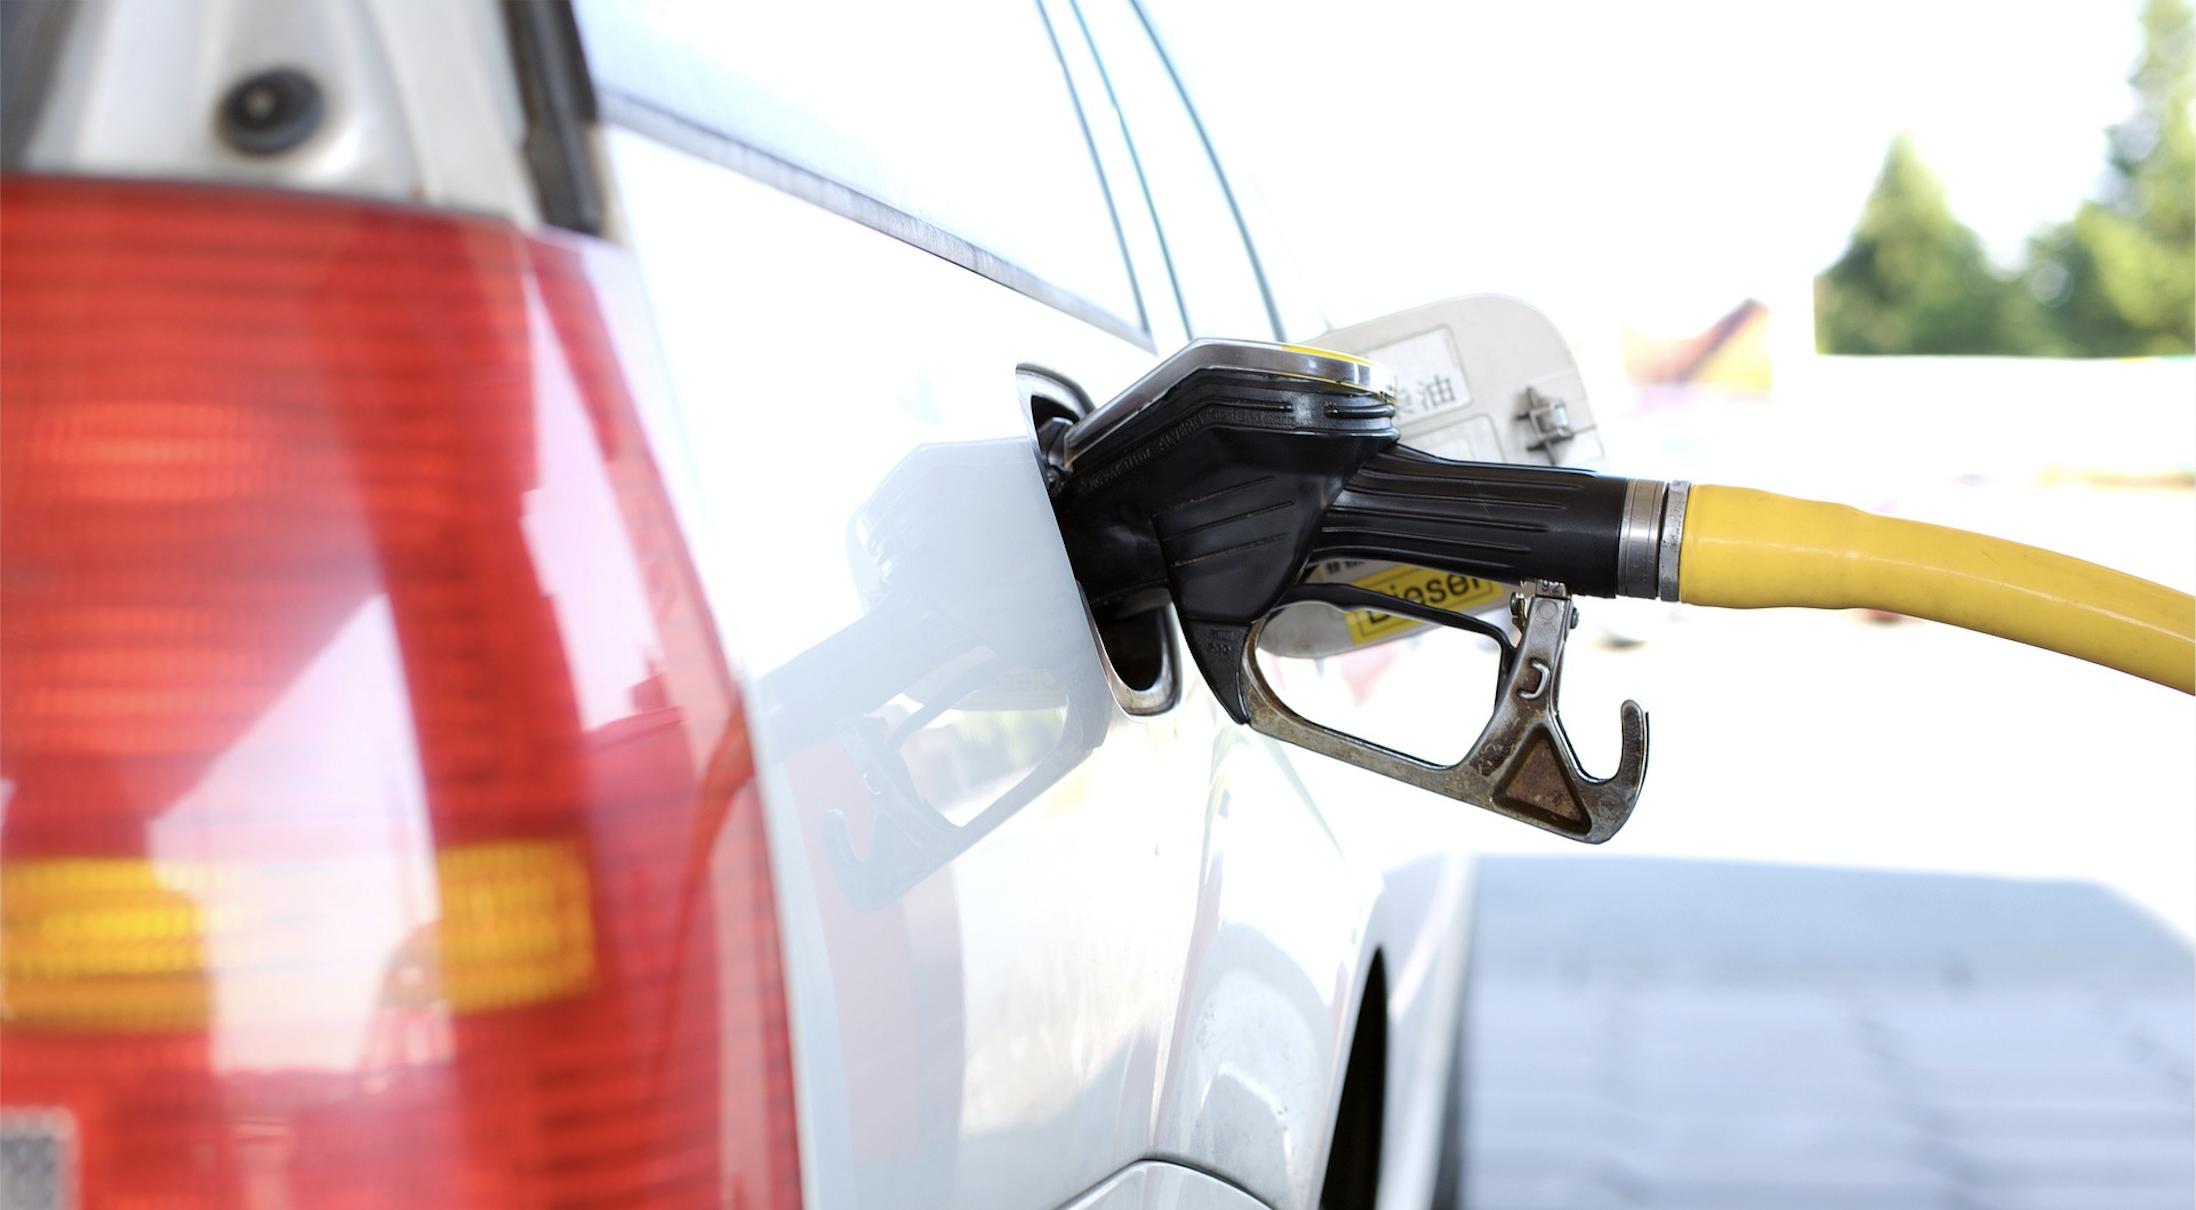 Gas Relay Service on zkSync showcase